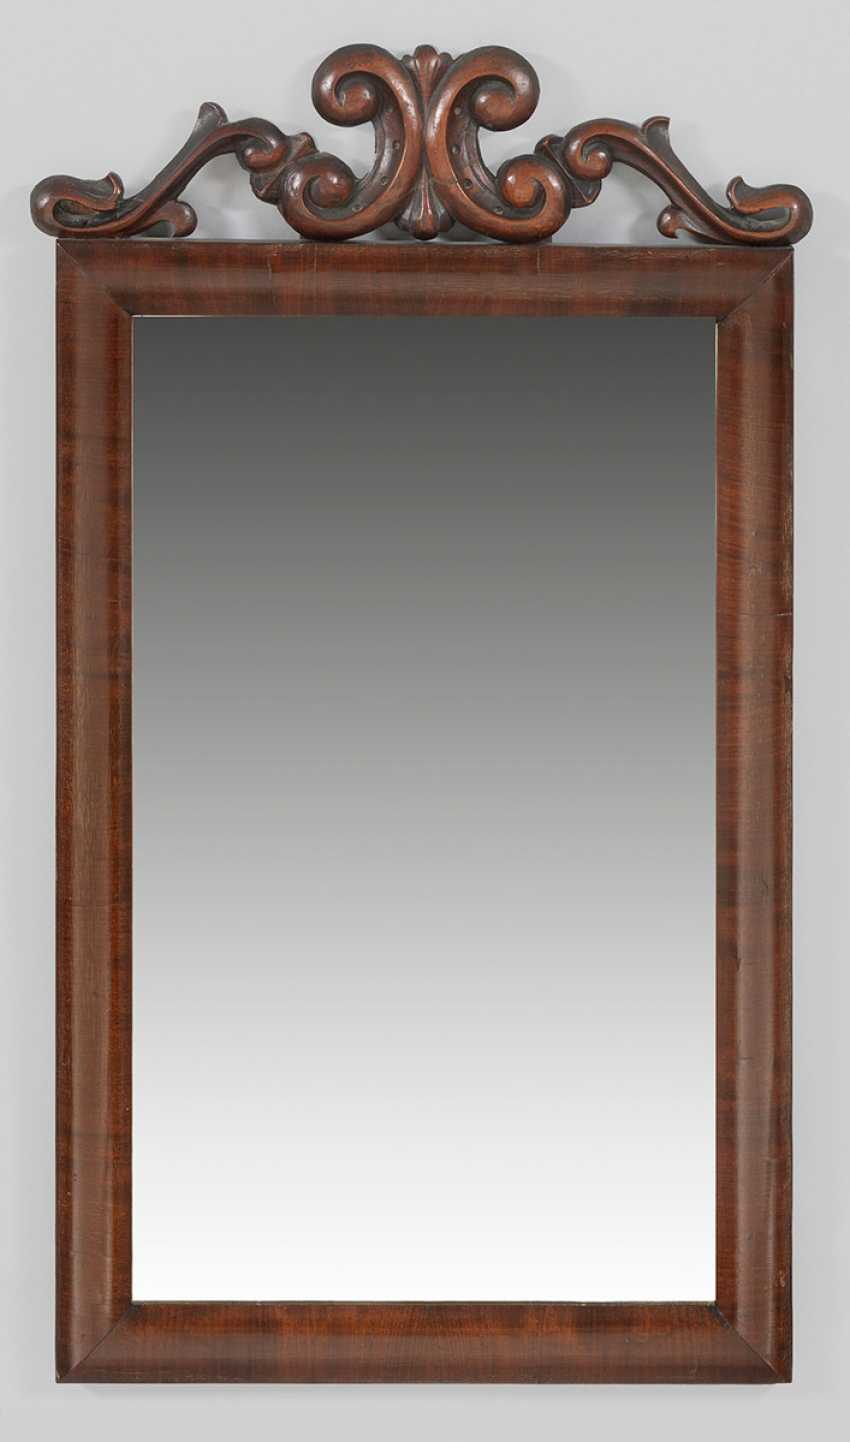 Small Wall Mirror - photo 1